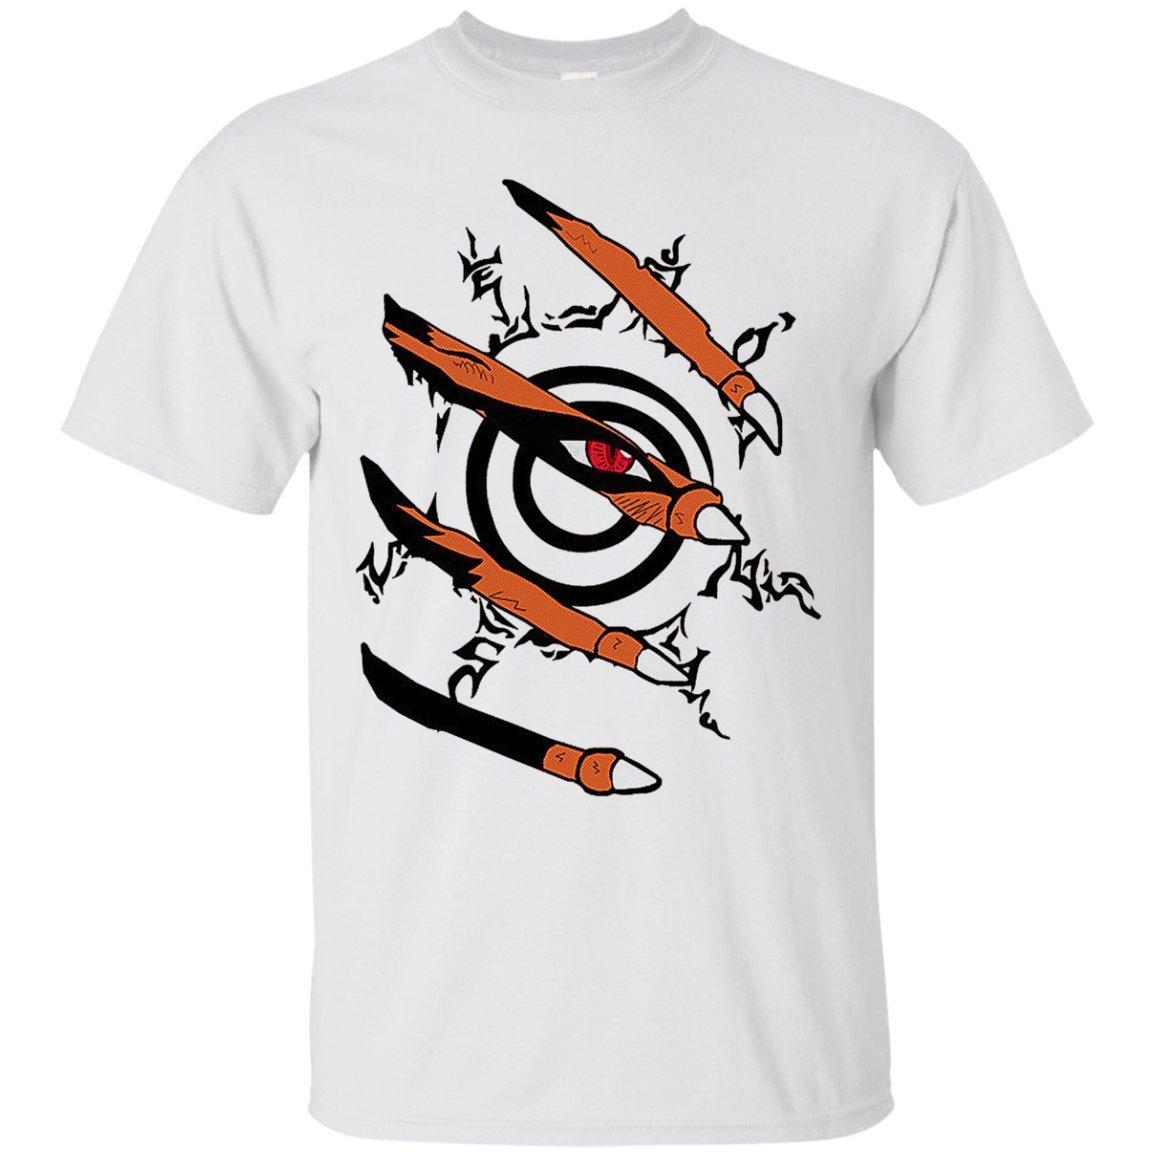 f377b6837 Amazon.com: Funny Naruto Apparel -Kurama Claw Naruto T-Shirt: Clothing